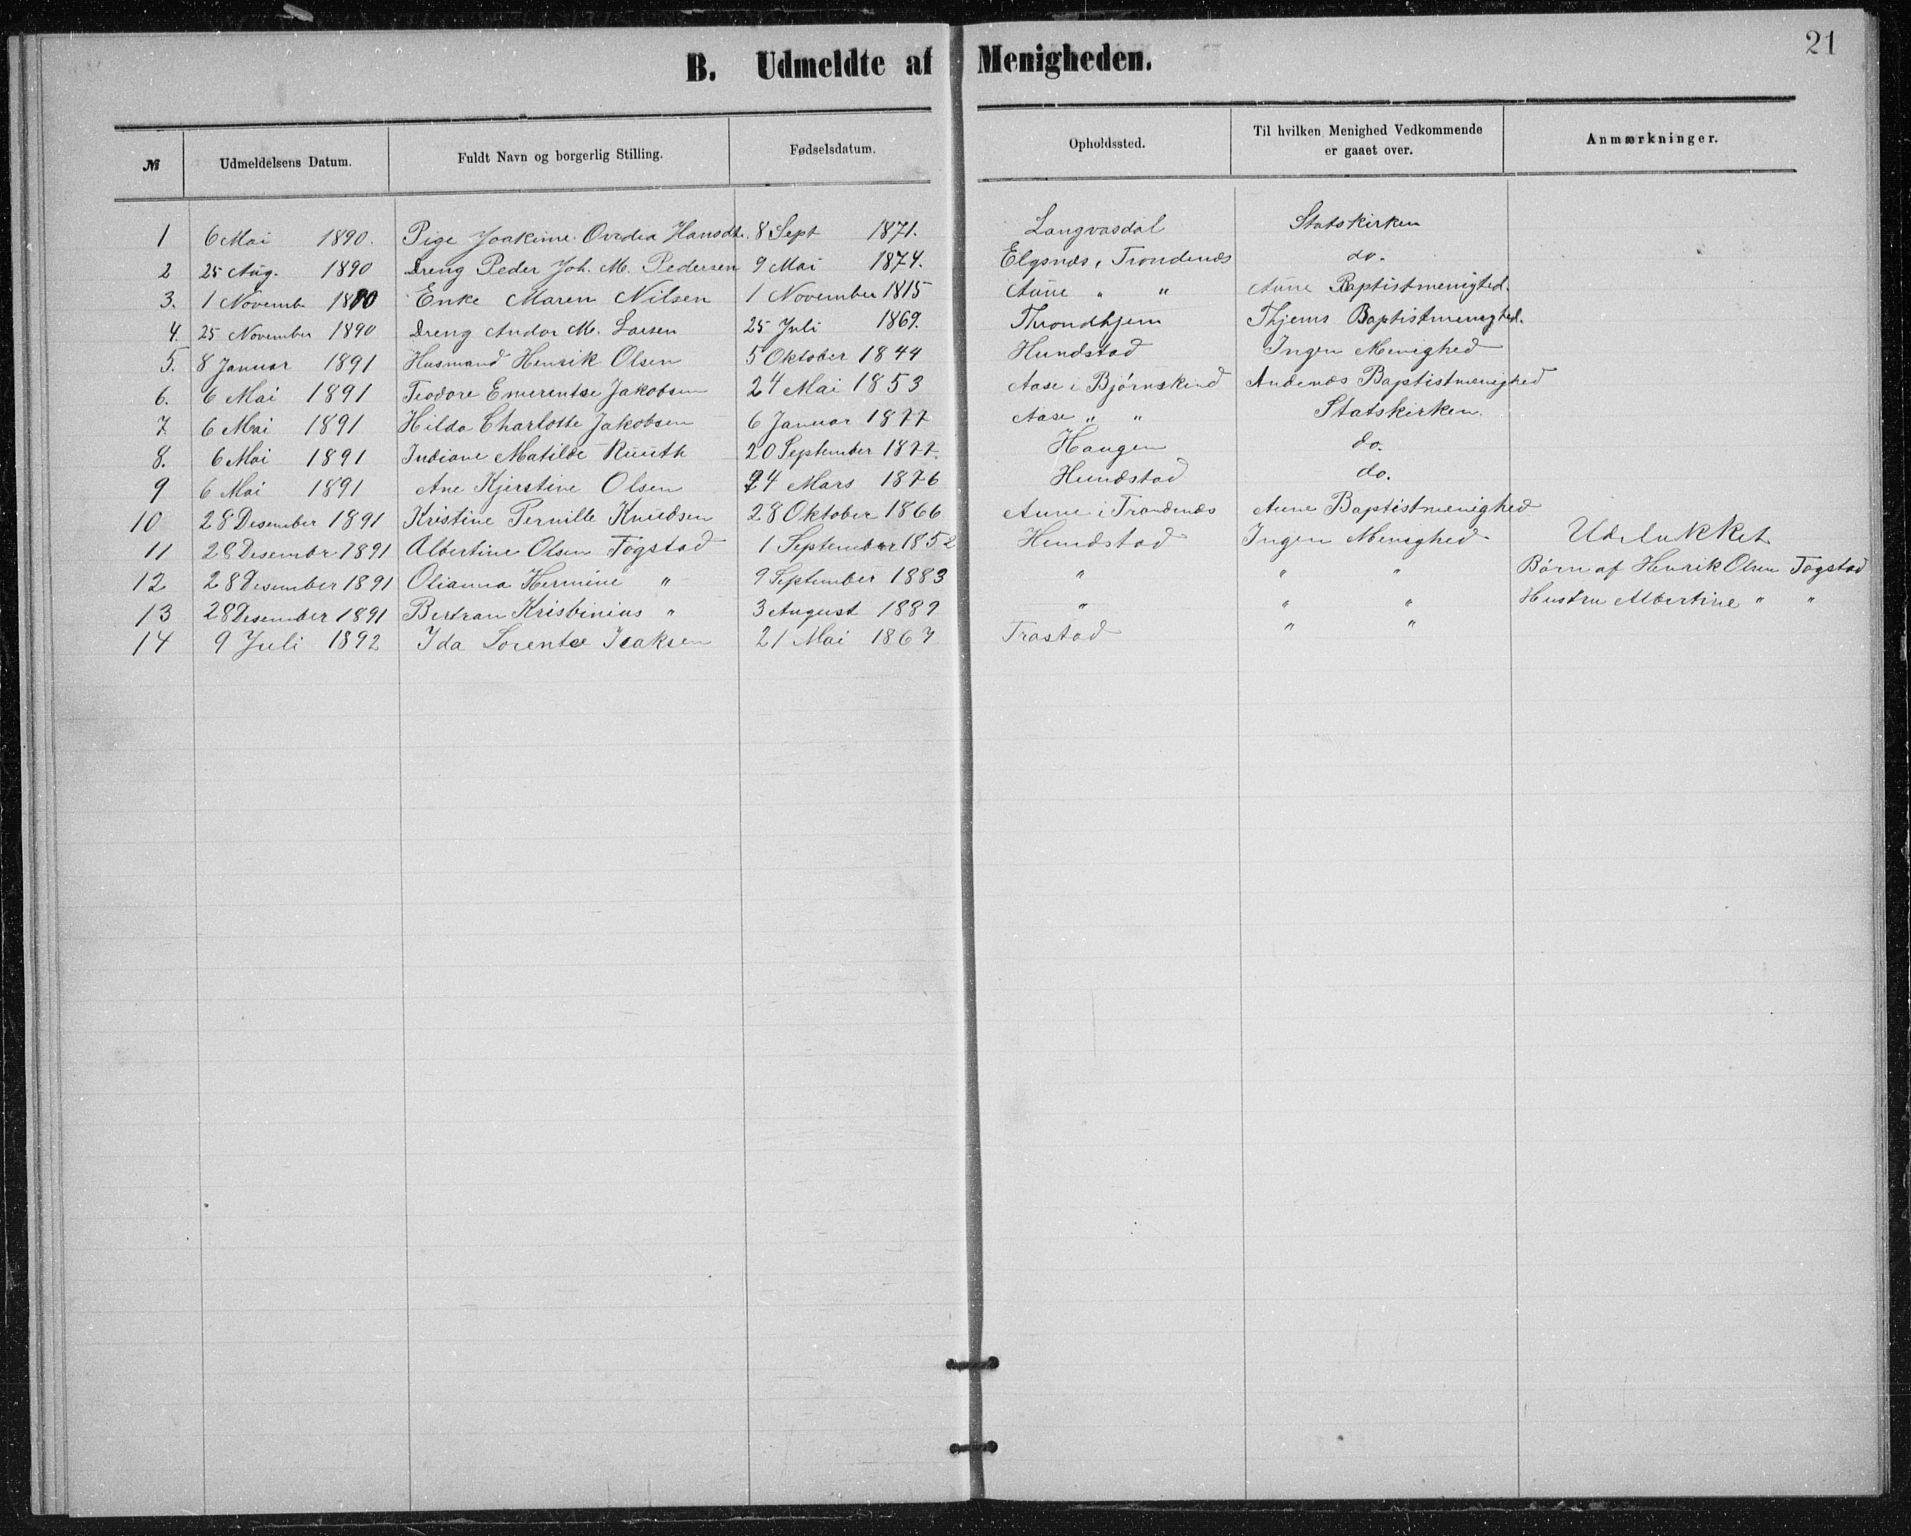 SATØ, Uten arkivreferanse, Dissenterprotokoll nr. DP 4, 1877-1892, s. 21